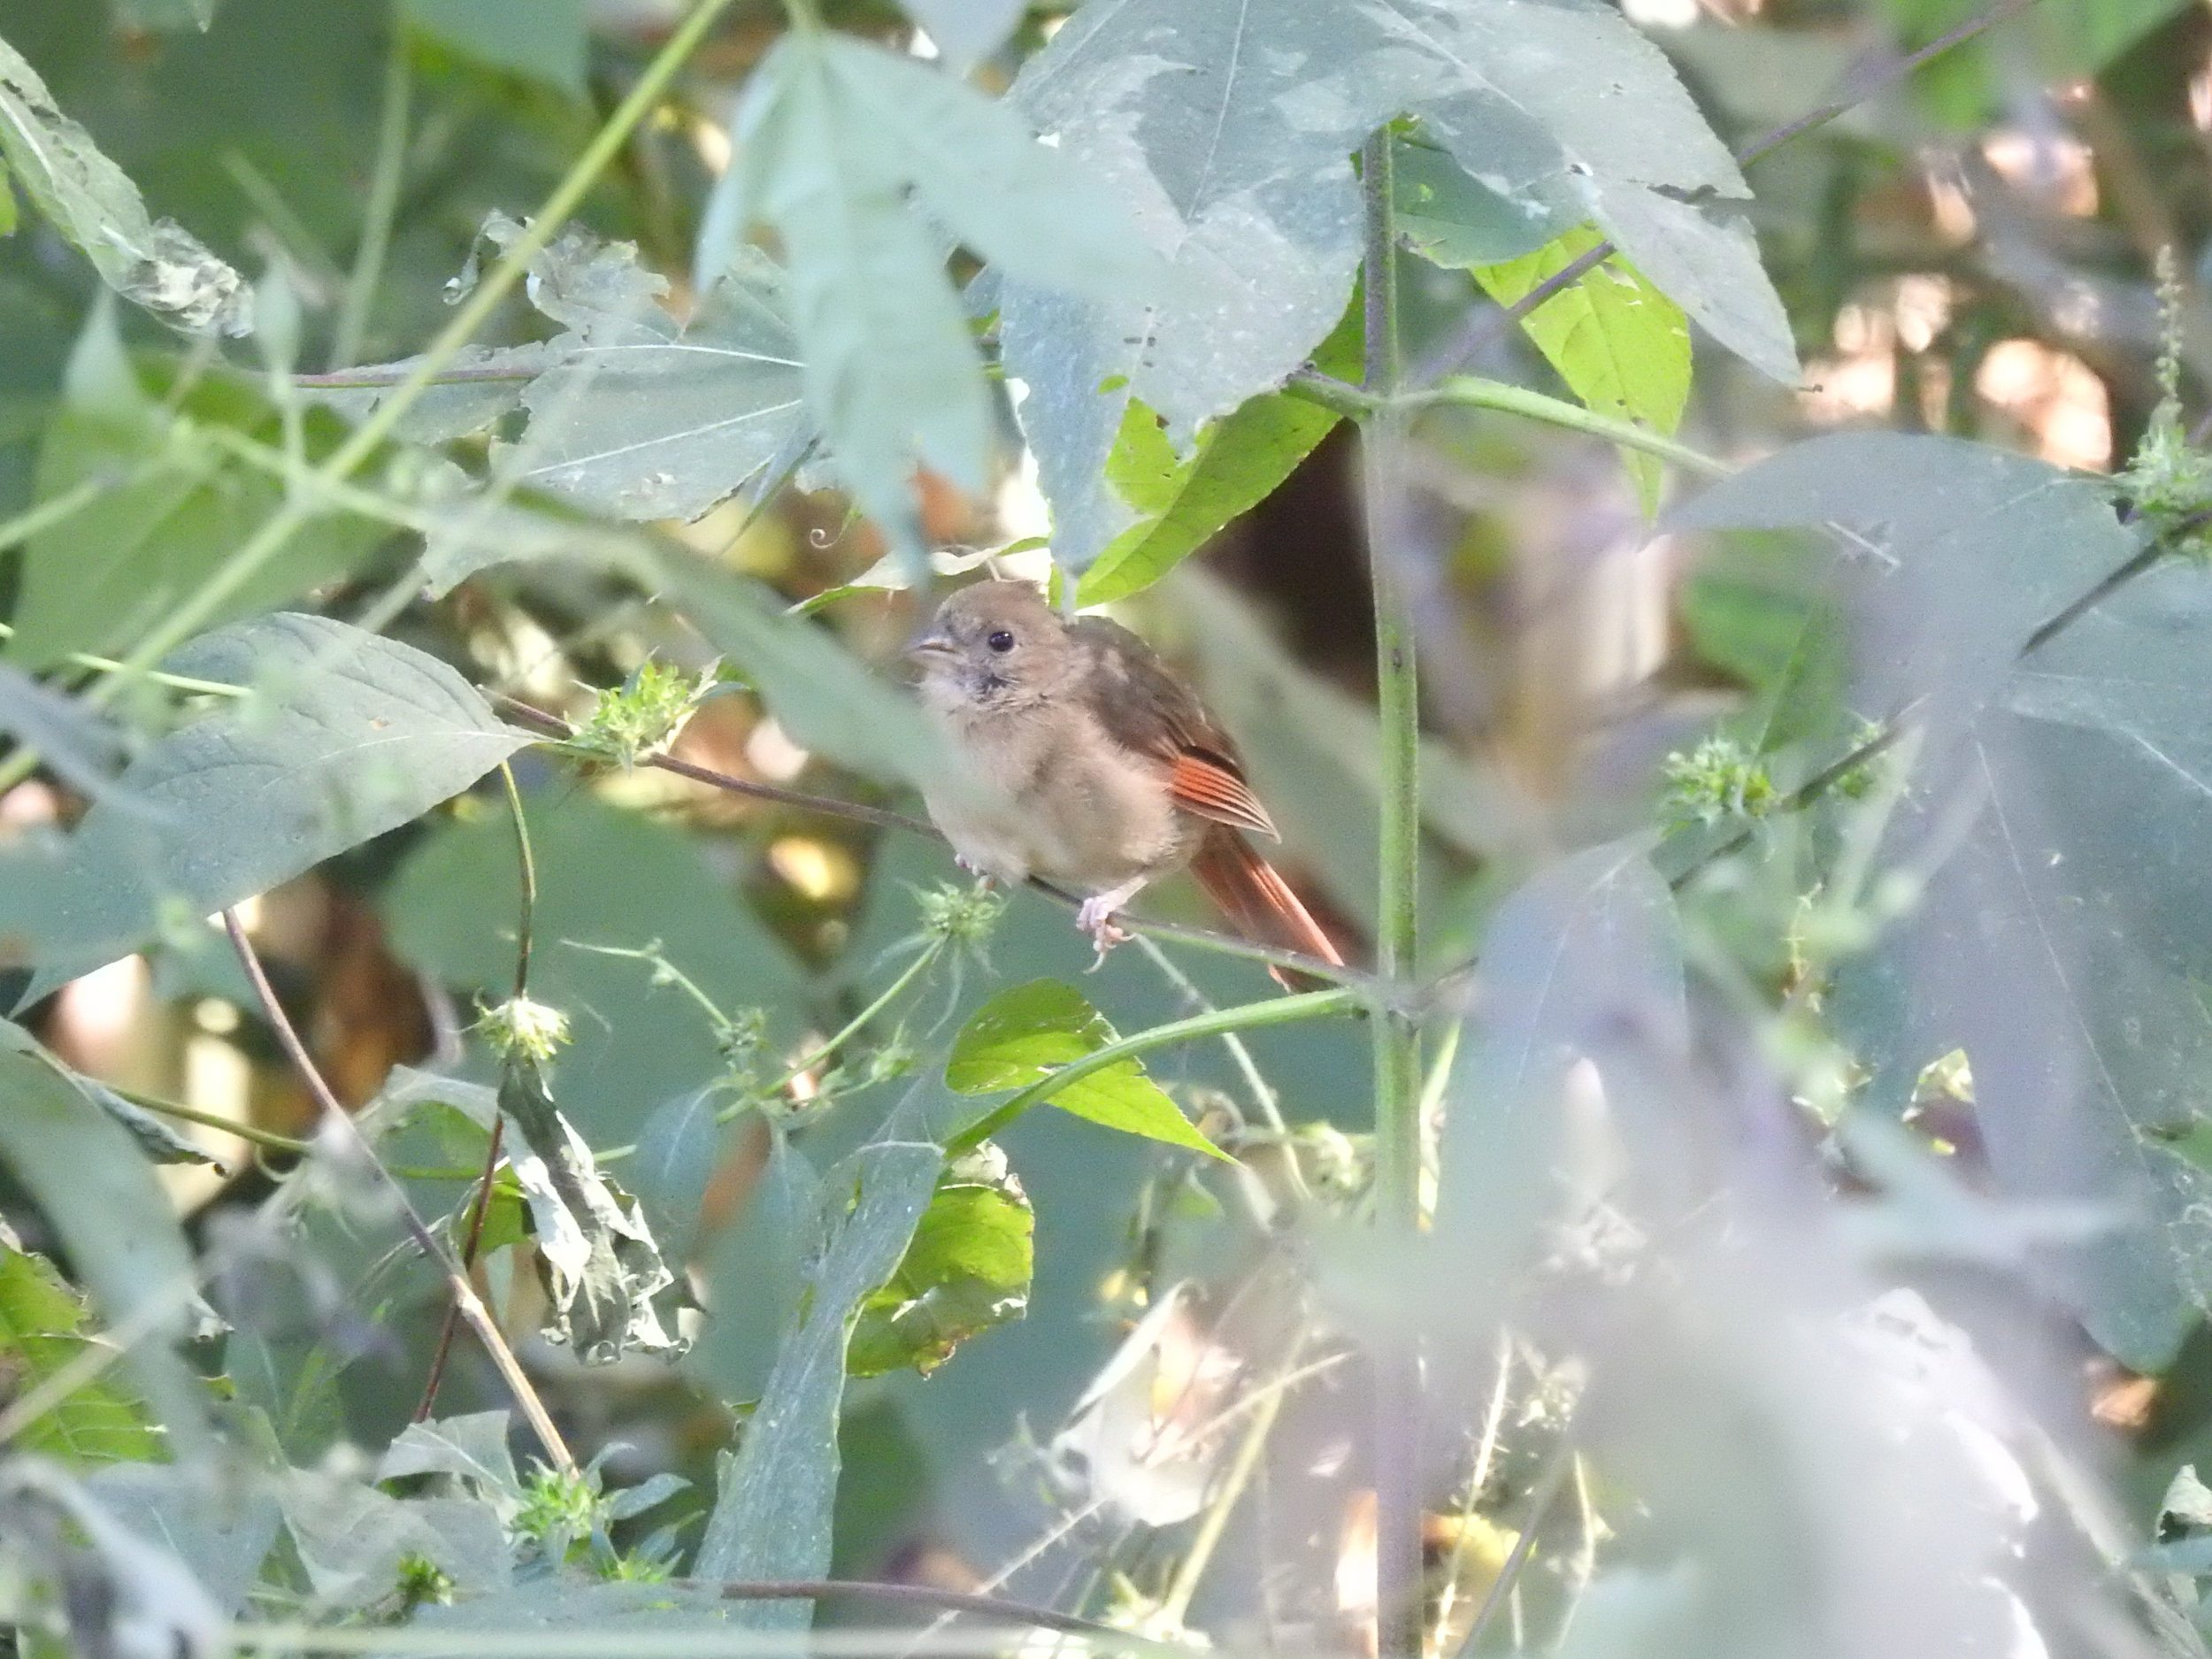 Northern Cardinal, immature